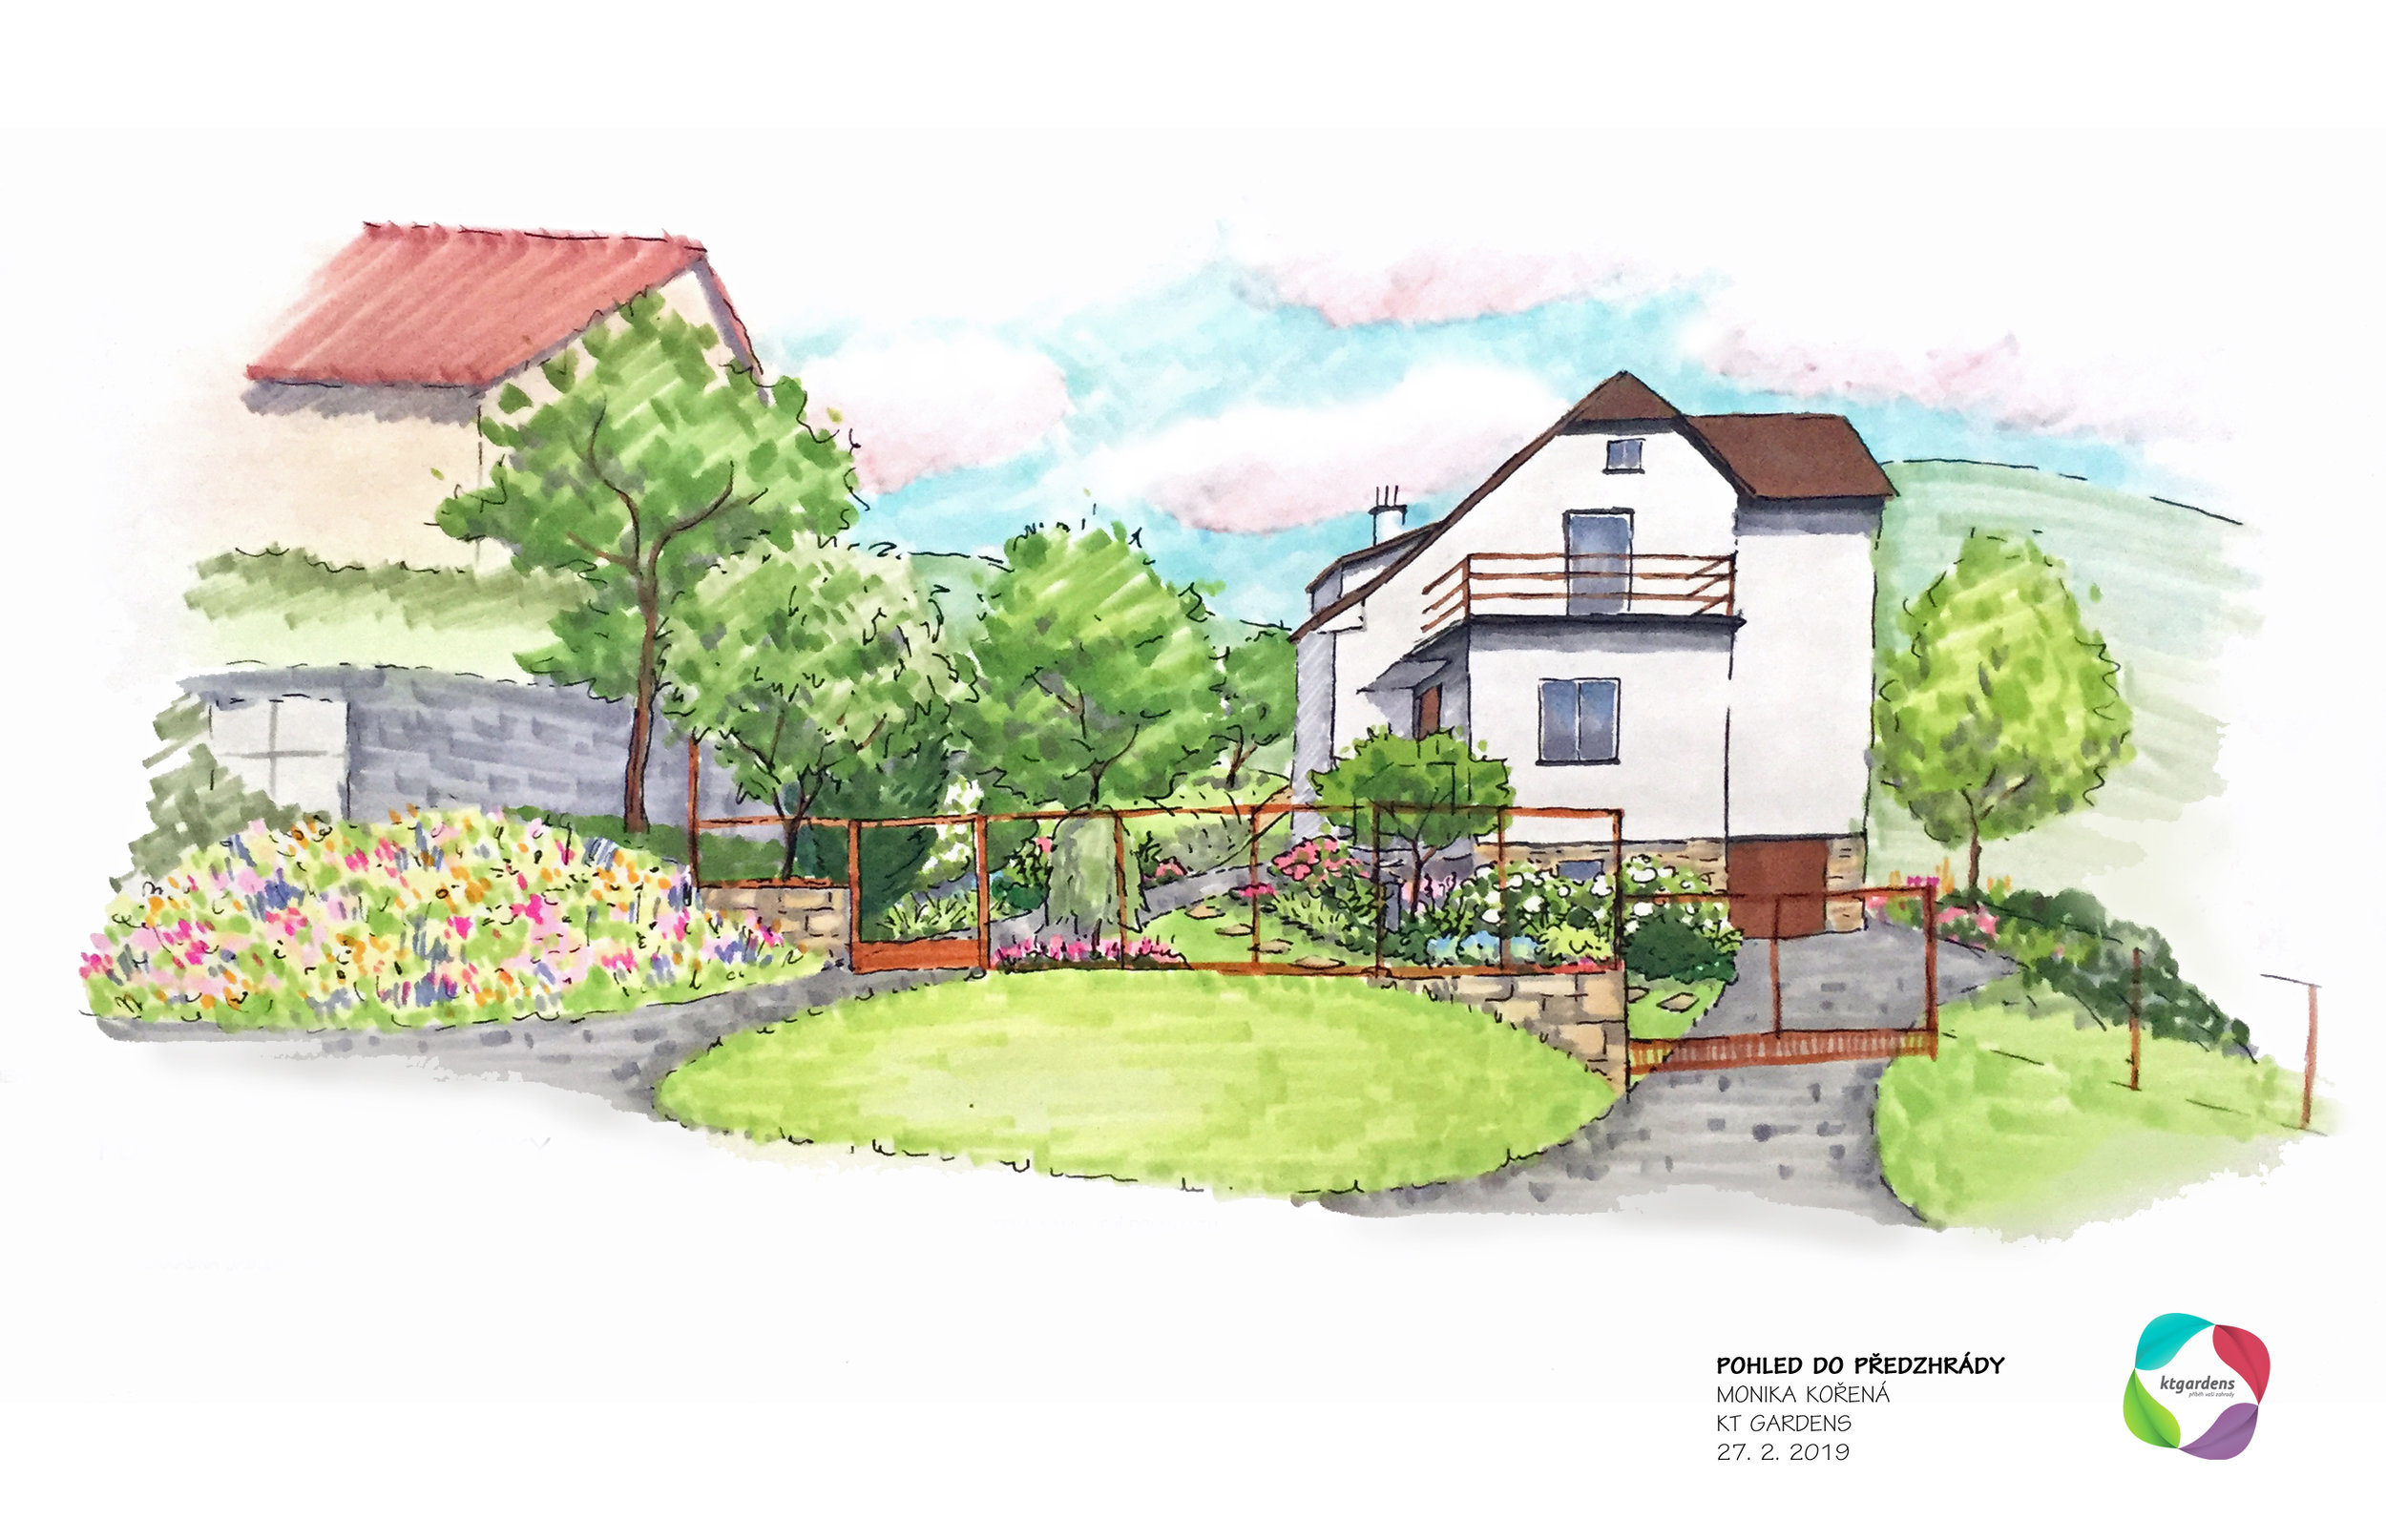 Návrh zahrady ve Štramberku, venkovská zahrada, přírodní zahrada, KTgardens